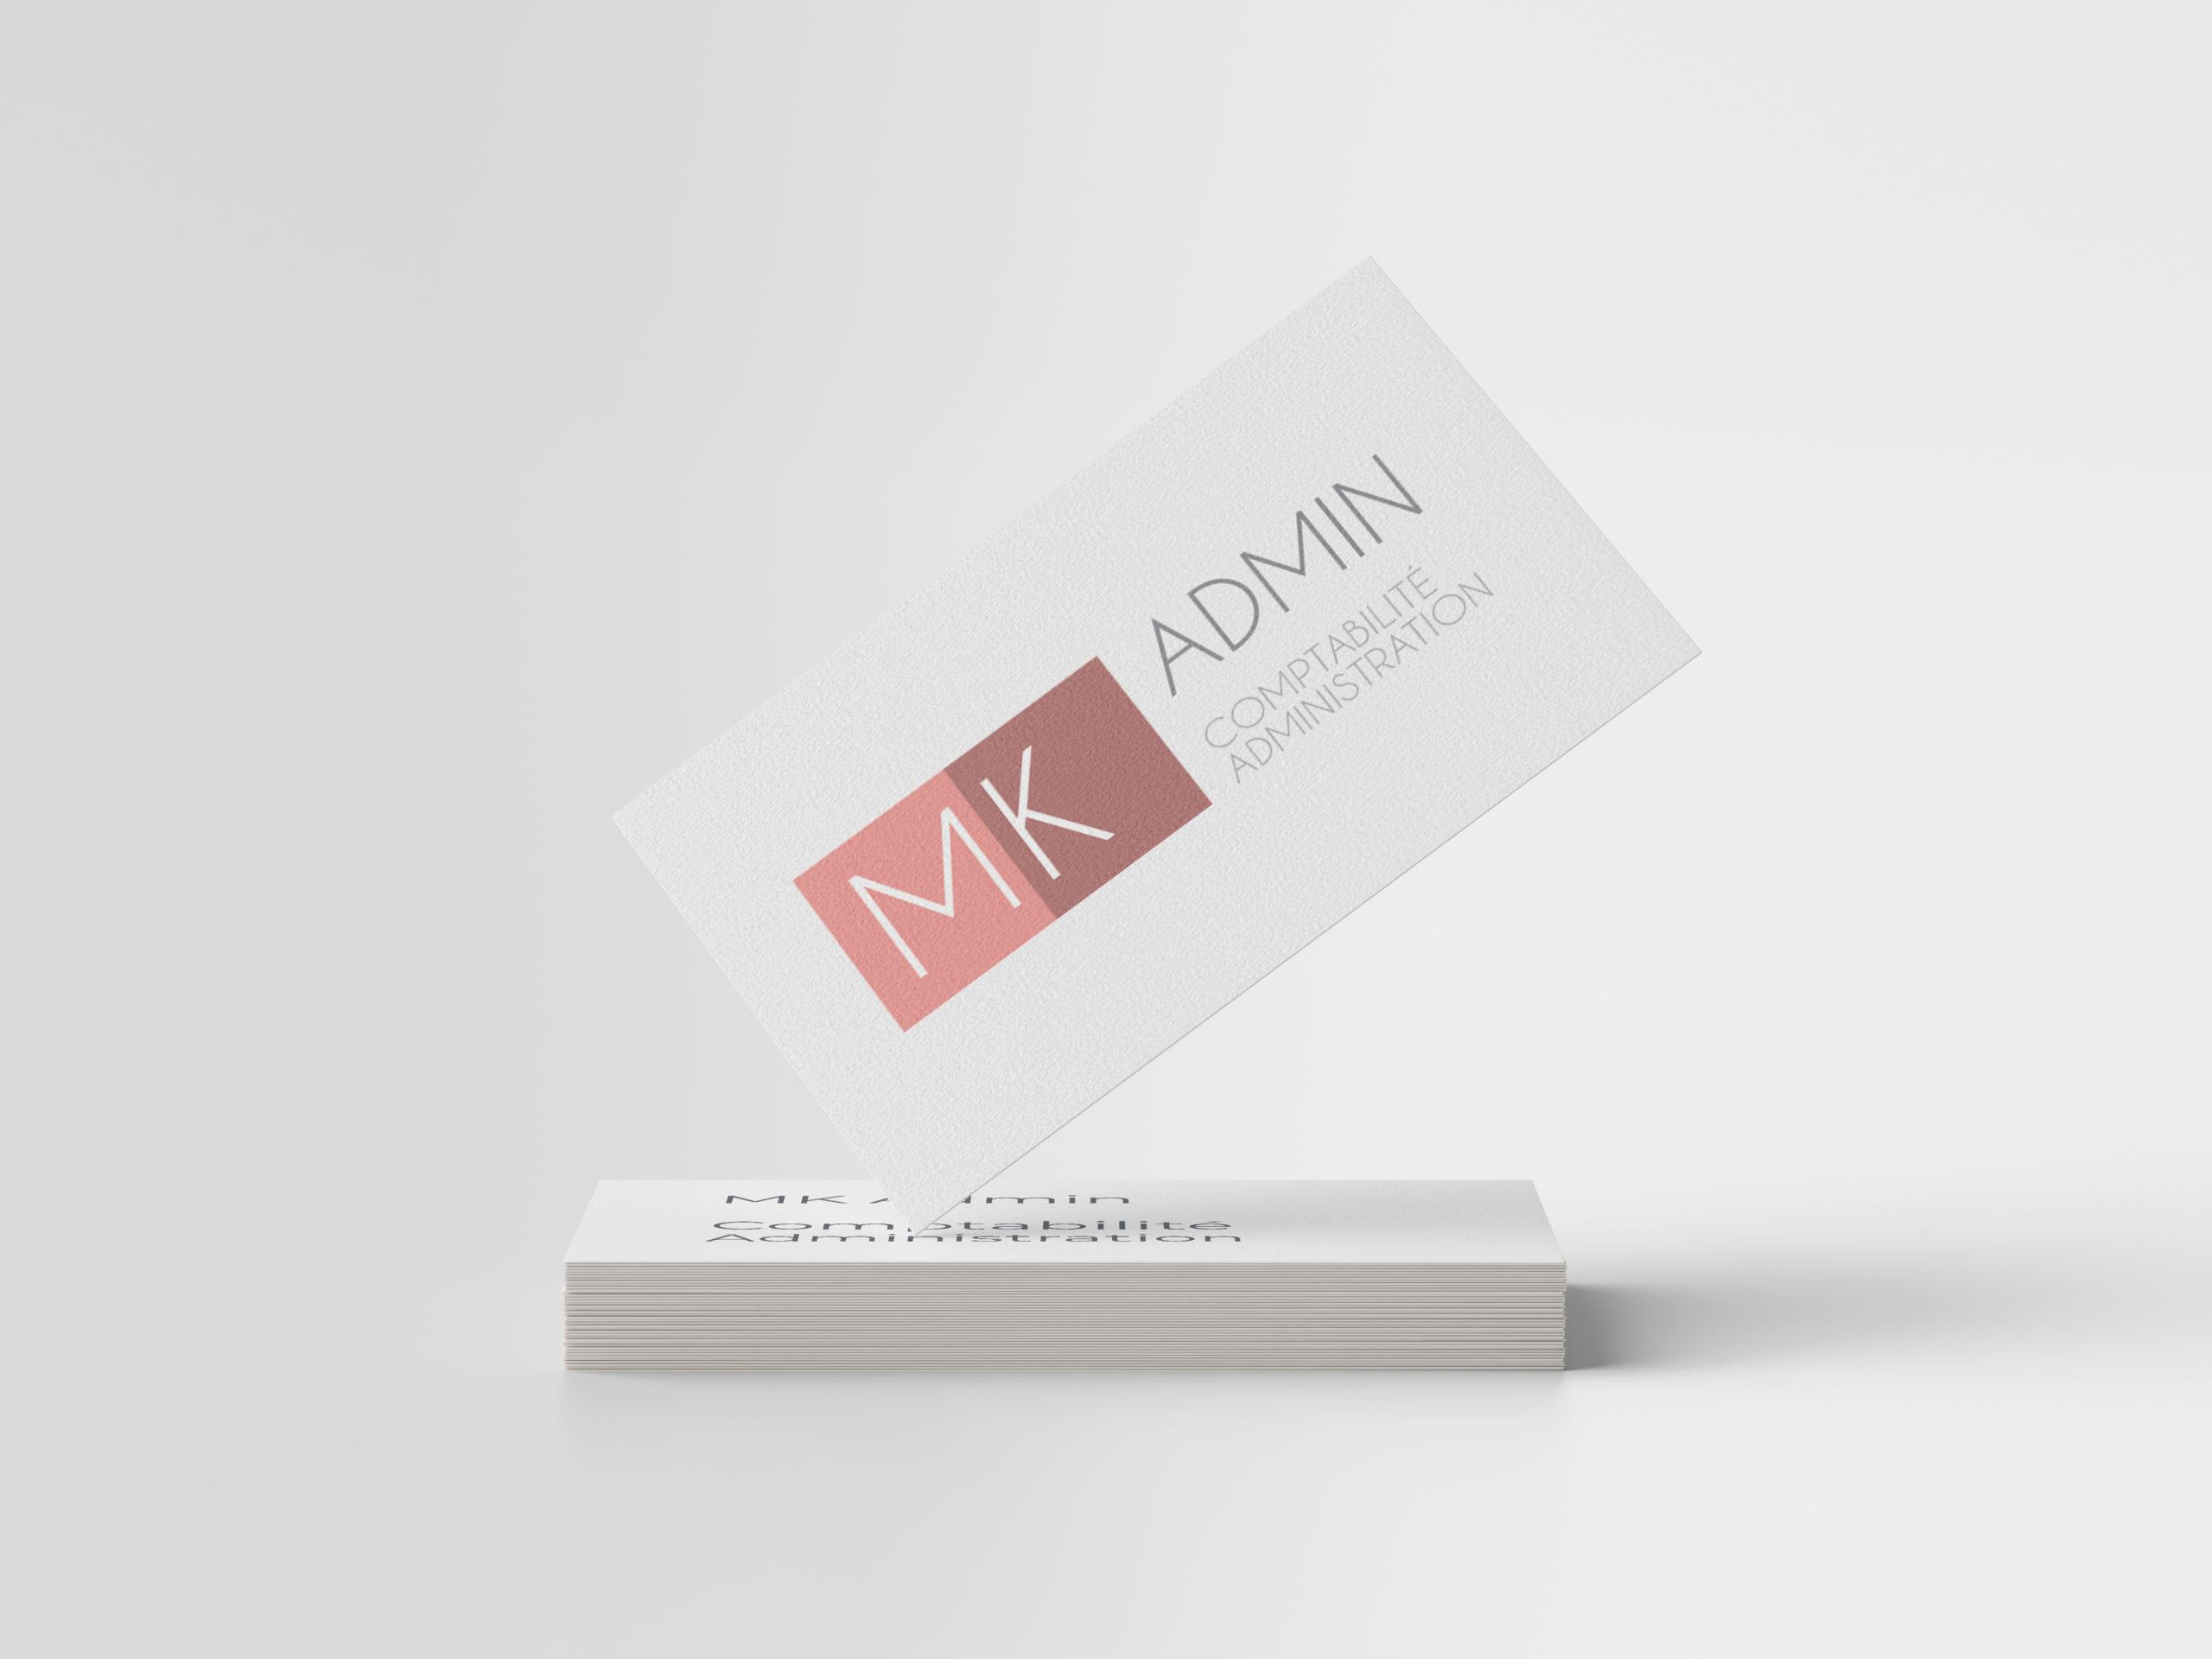 MK Admin